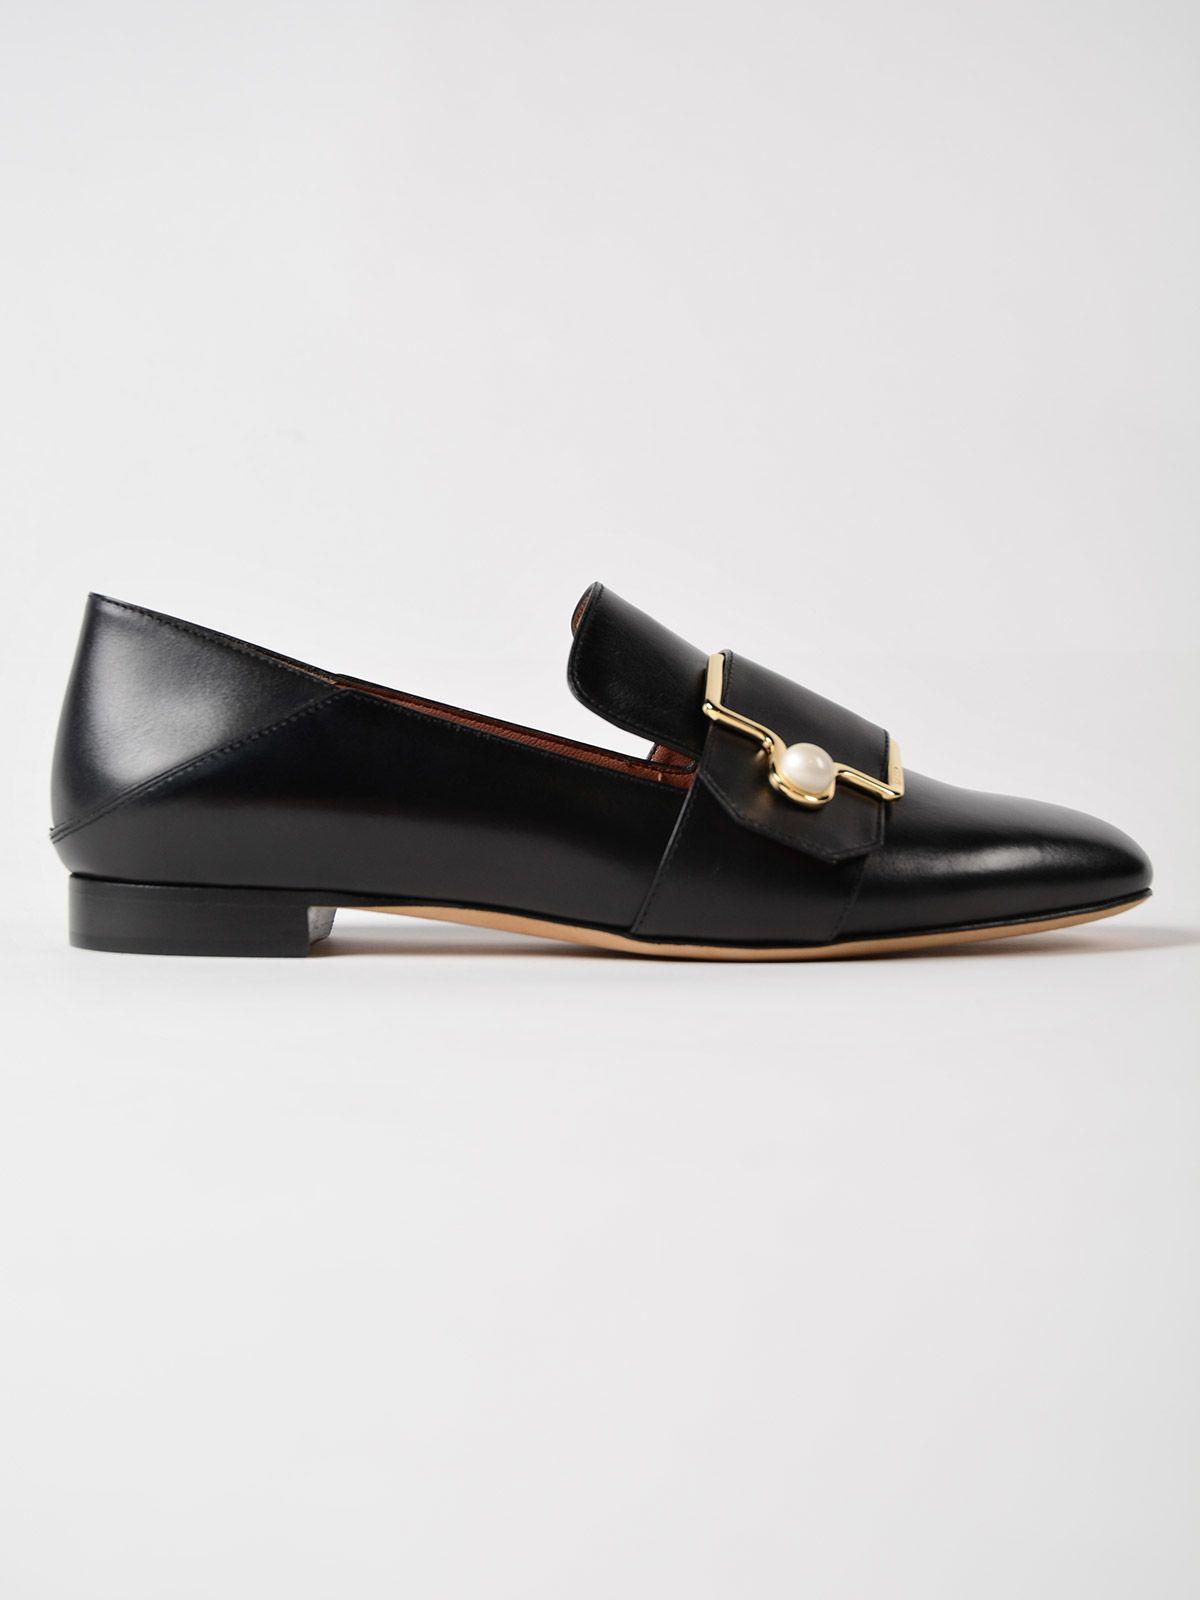 Maelle Black, Womens calf leather slipper in black Bally